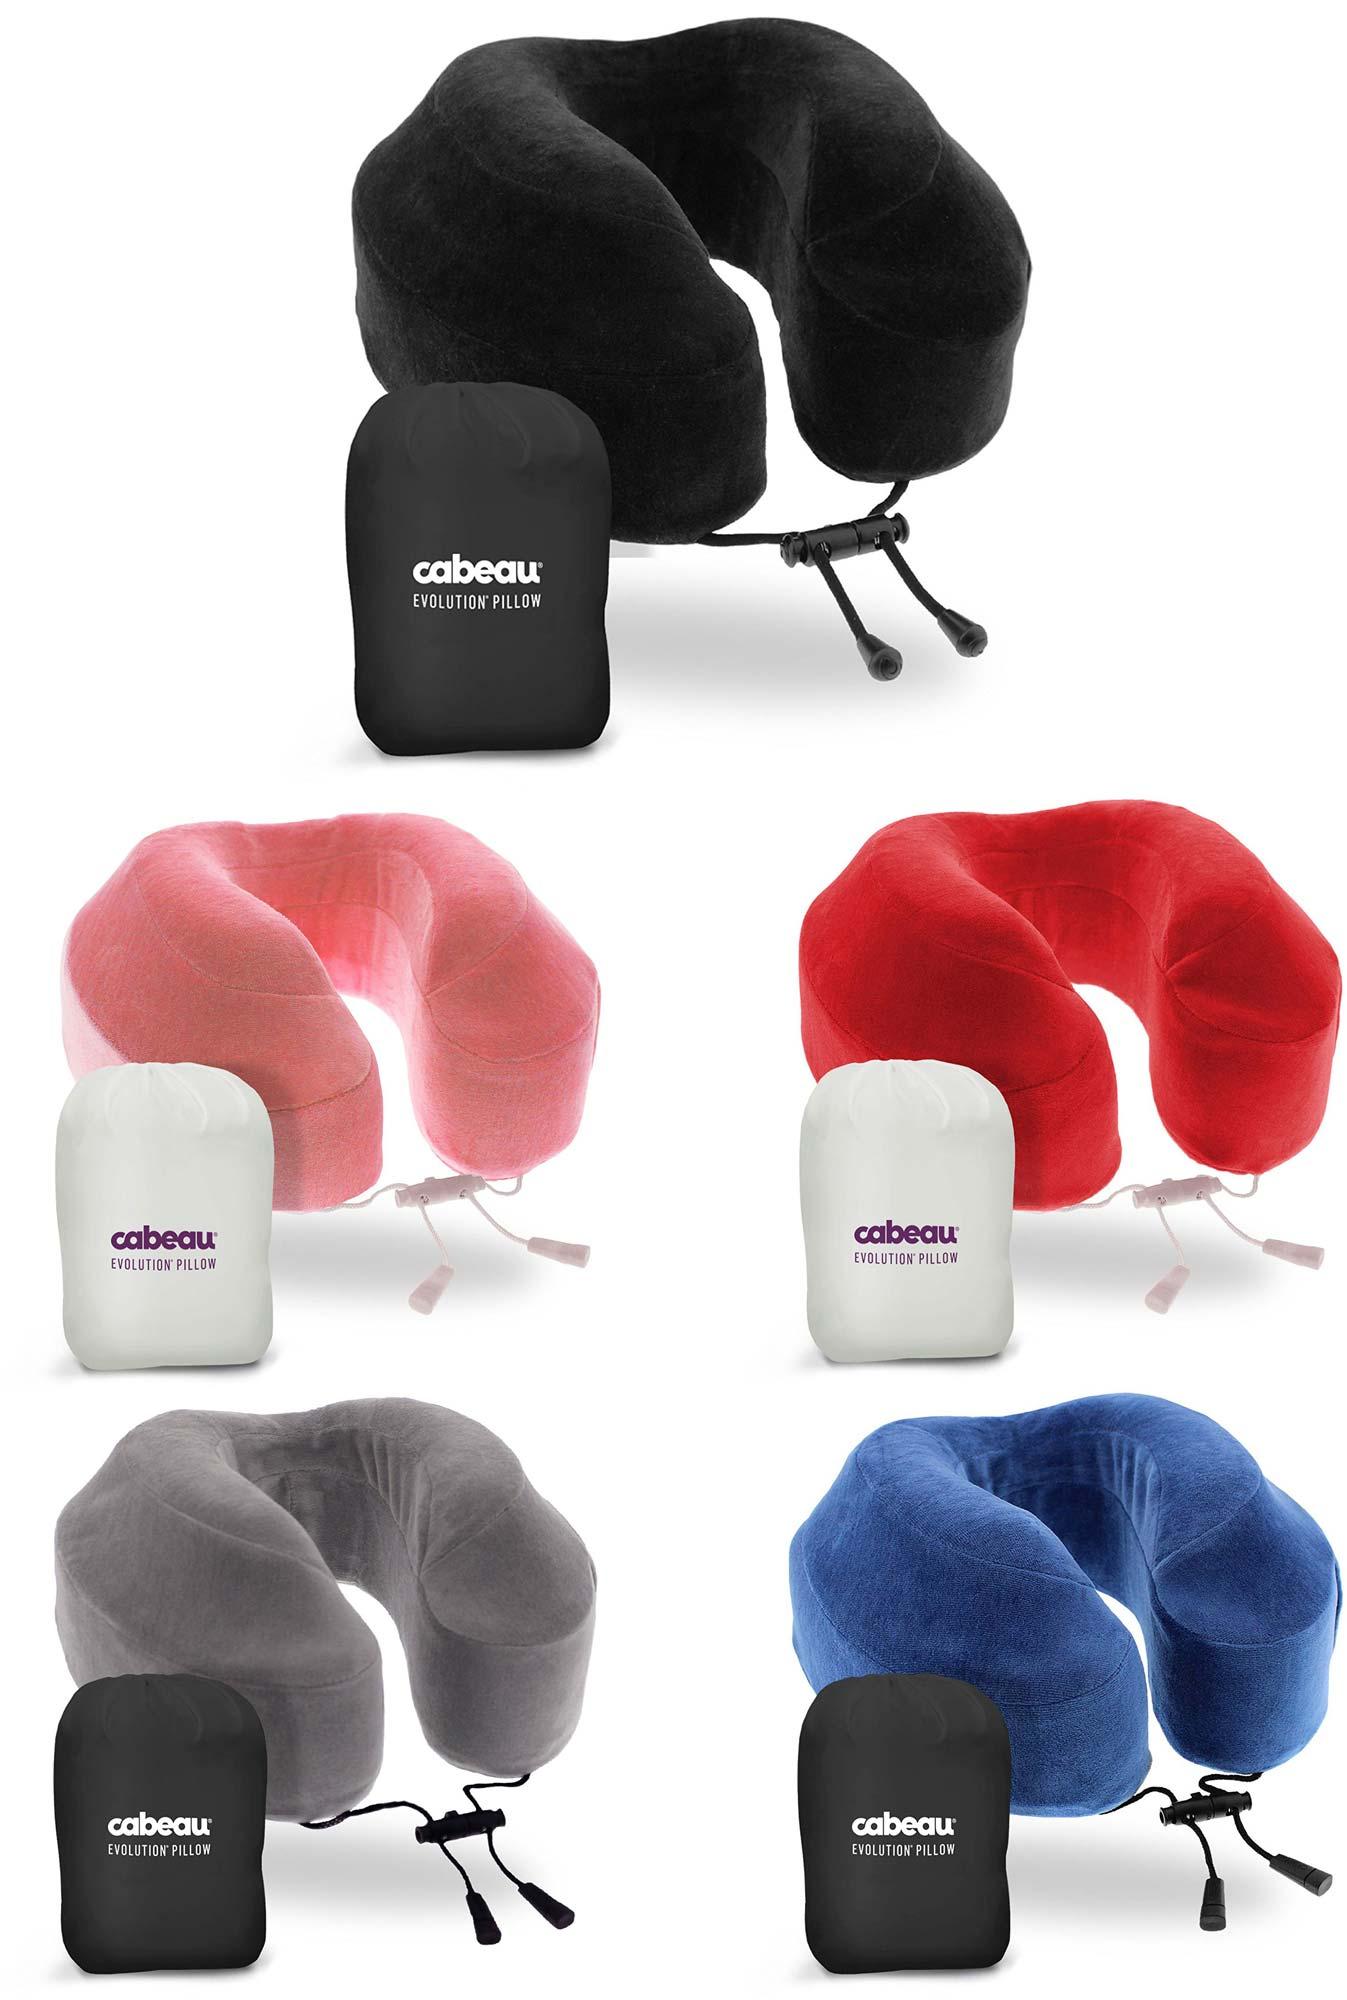 Cabeau Evolution Memory Foam Travel Pillow With Ear Plugs 4 Colours By Cabeau Evolution